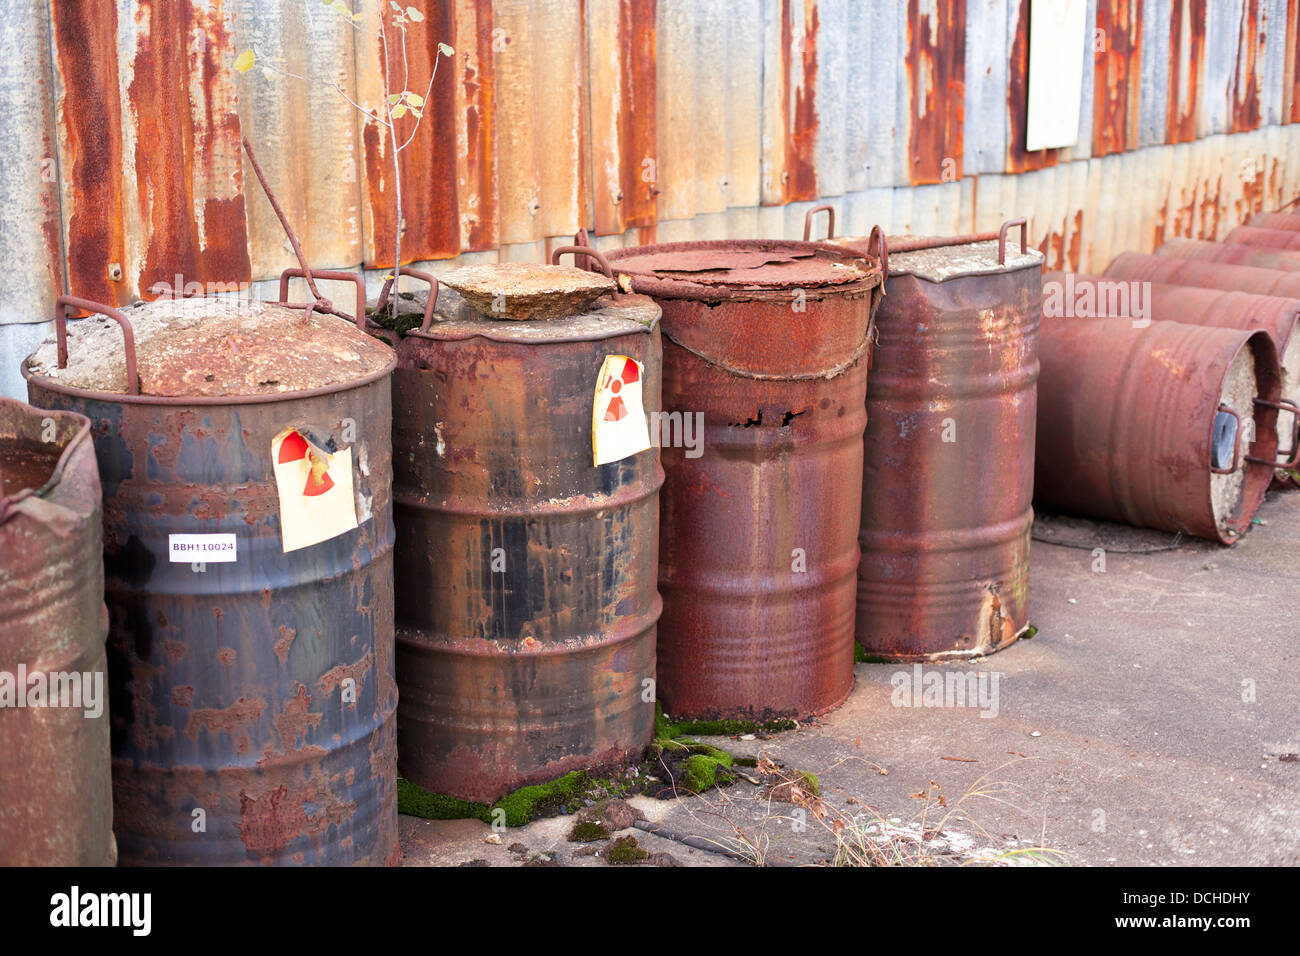 barrel with radioactive waste disposal Stock Photo